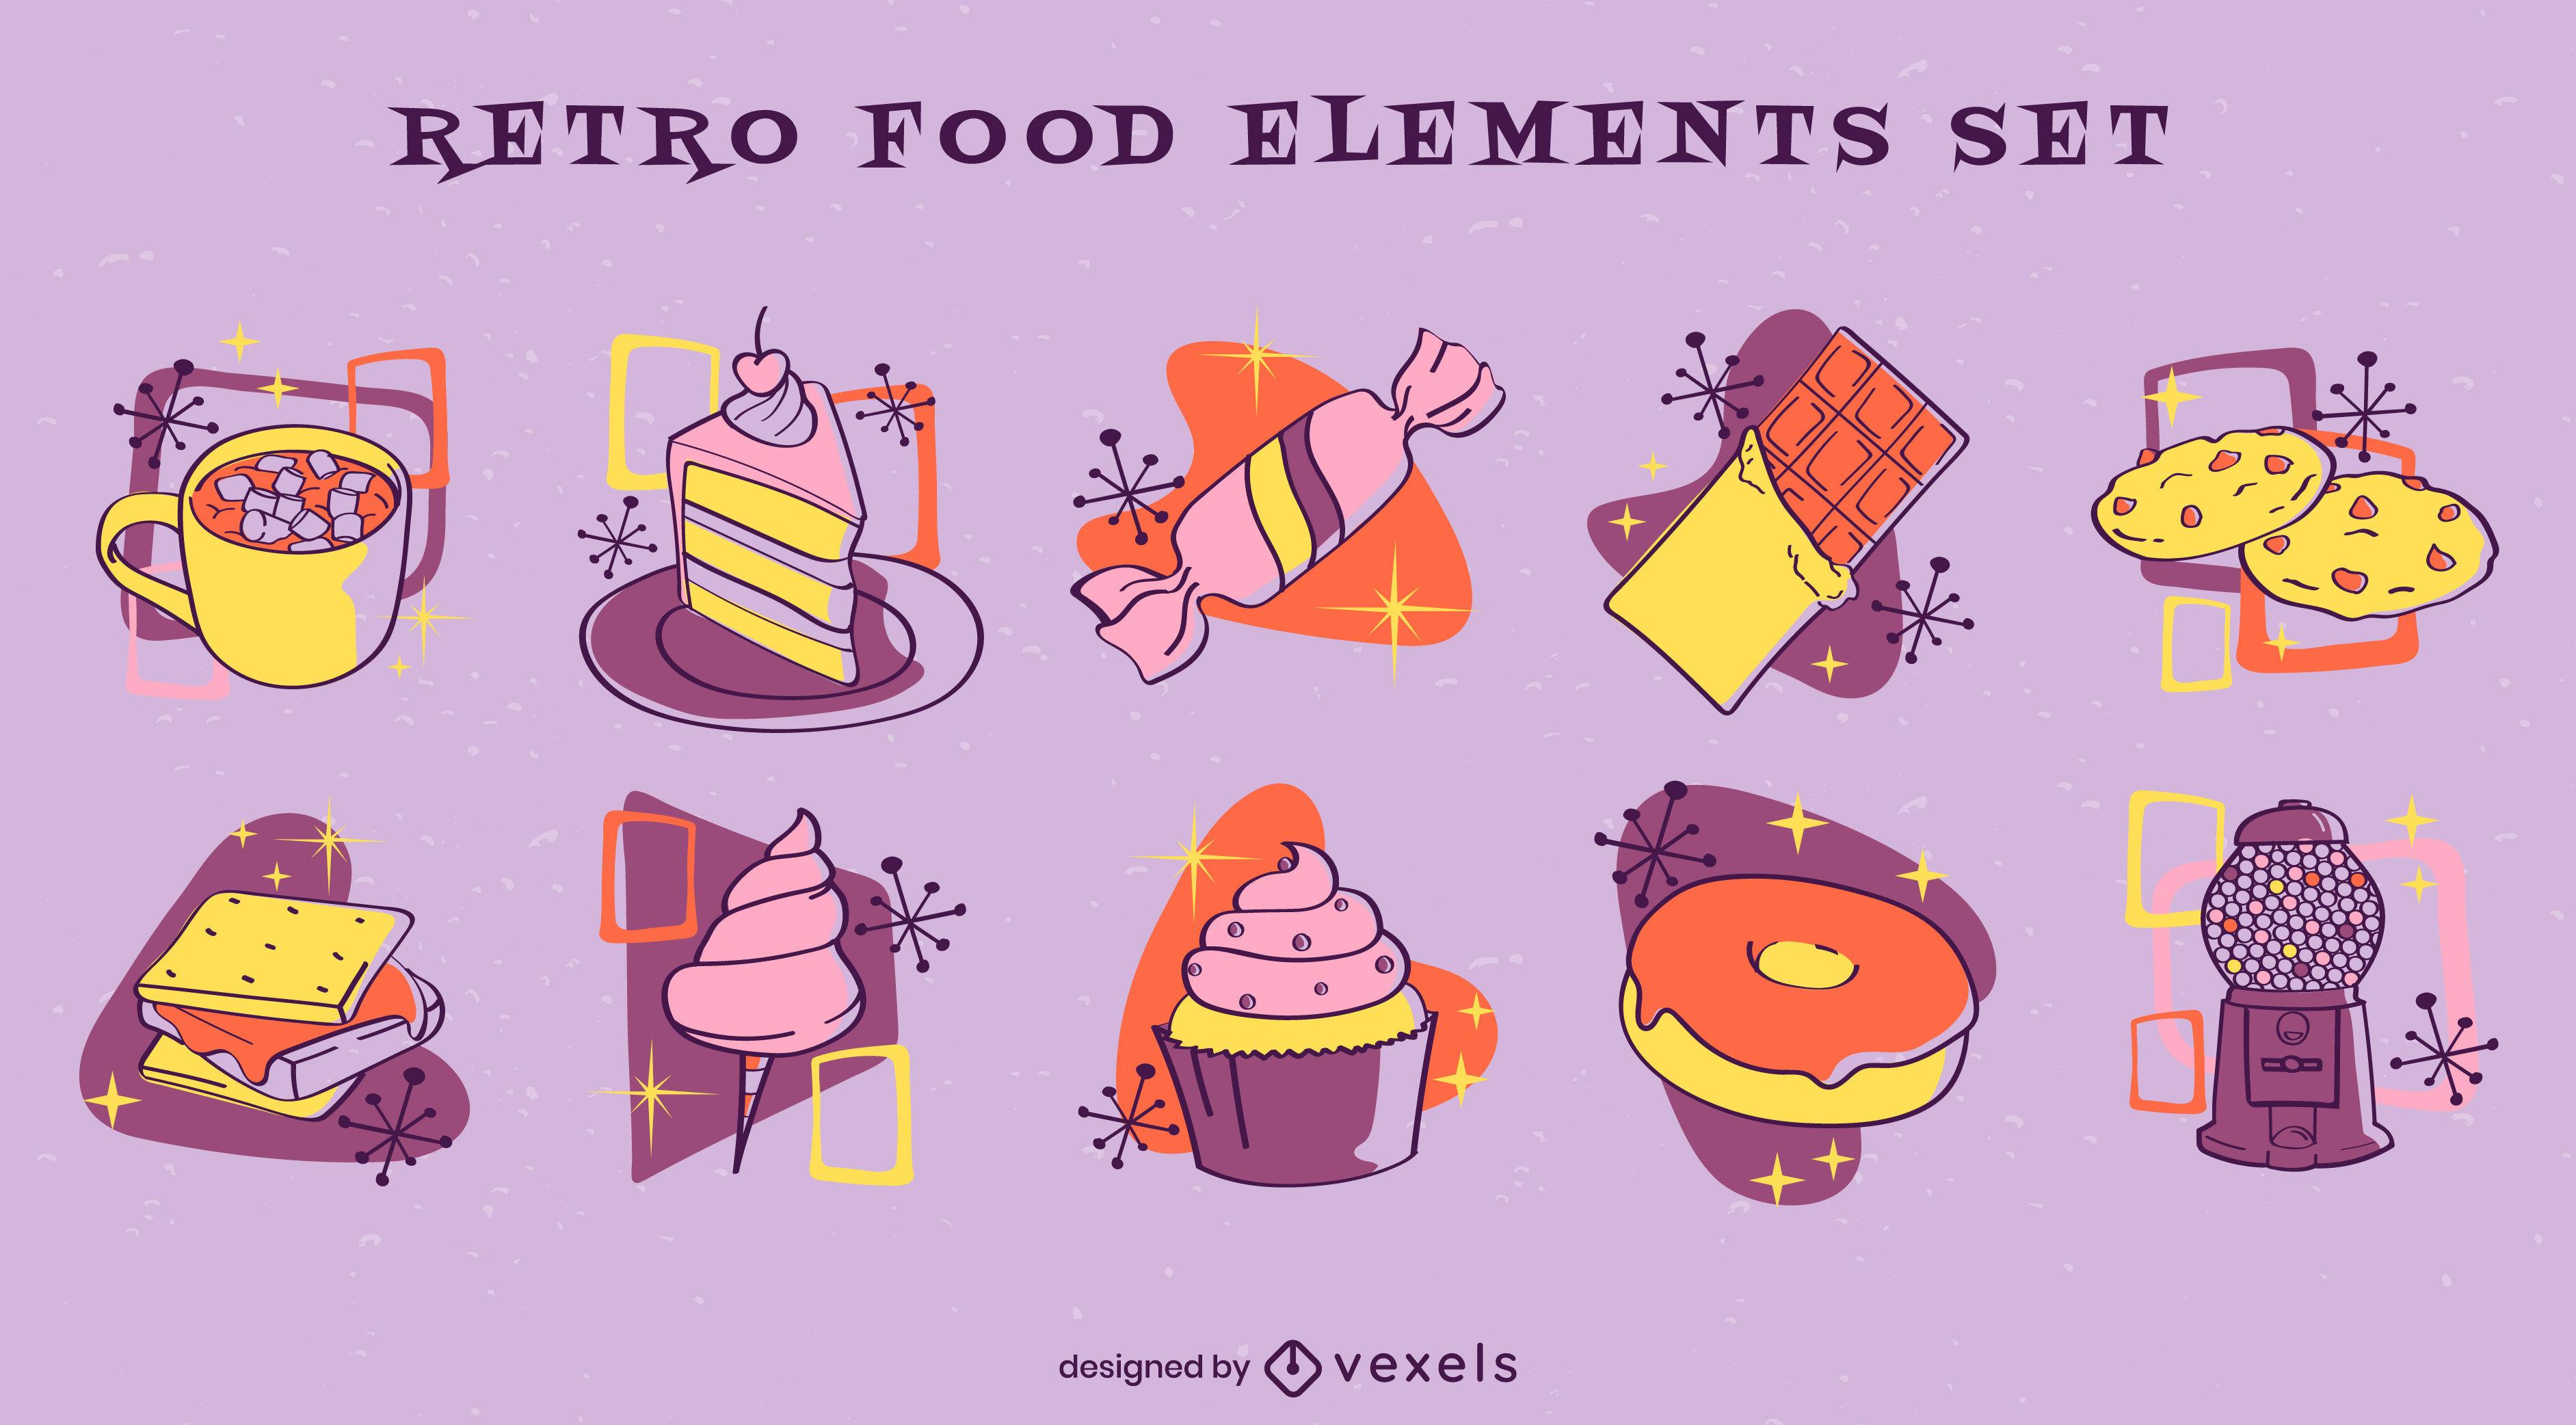 Retro food elements set